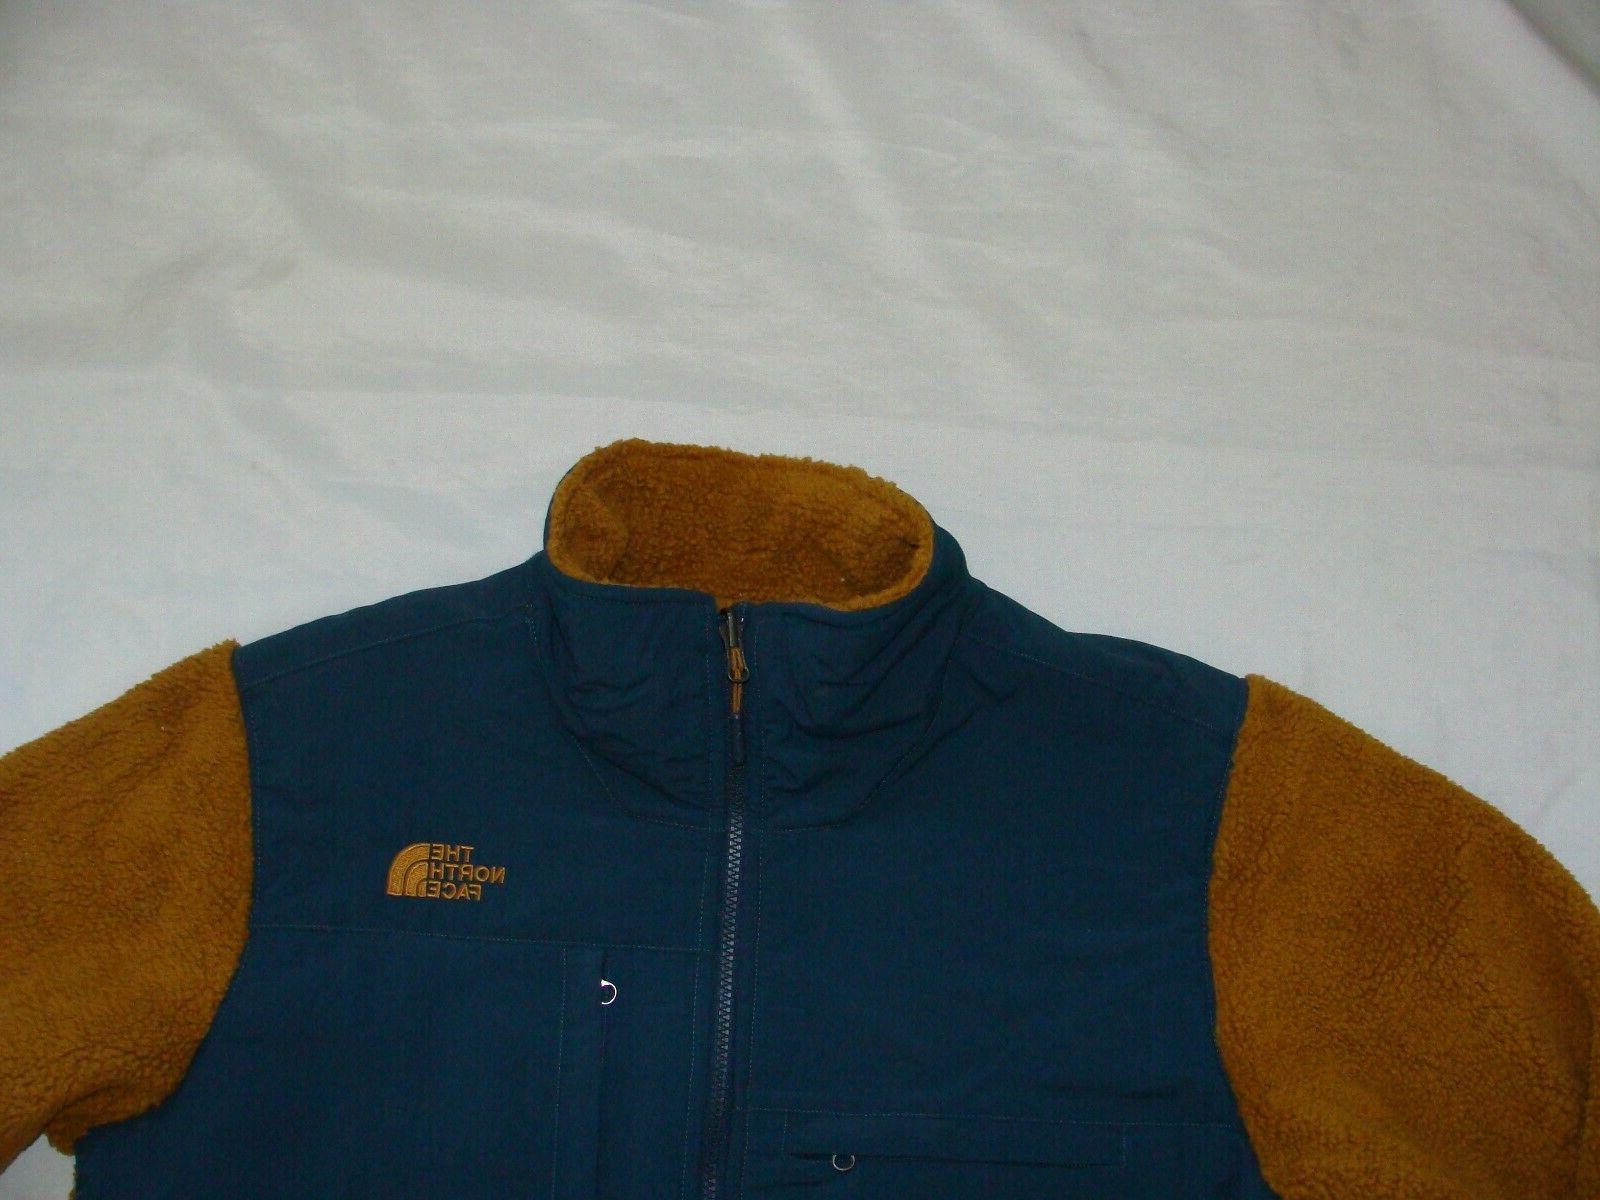 NWT The Sherpa Fleece Denali $180